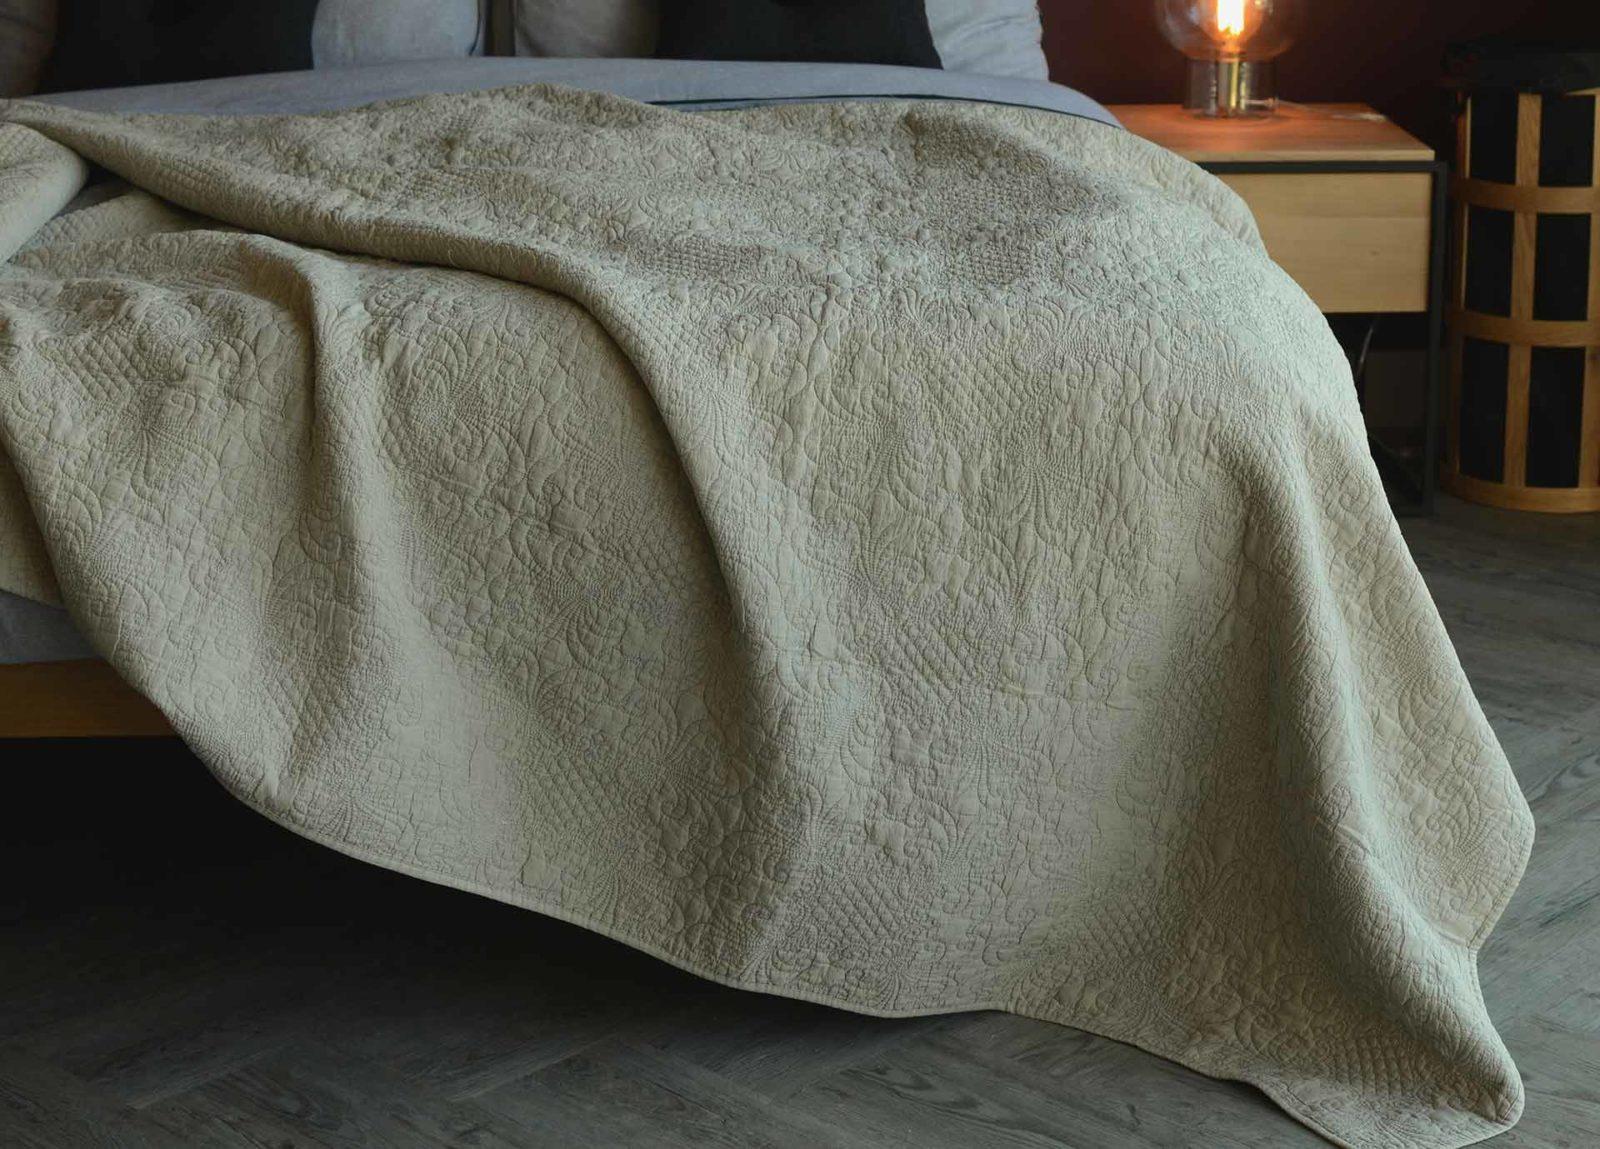 stonewash-embroidered-quilt-clay